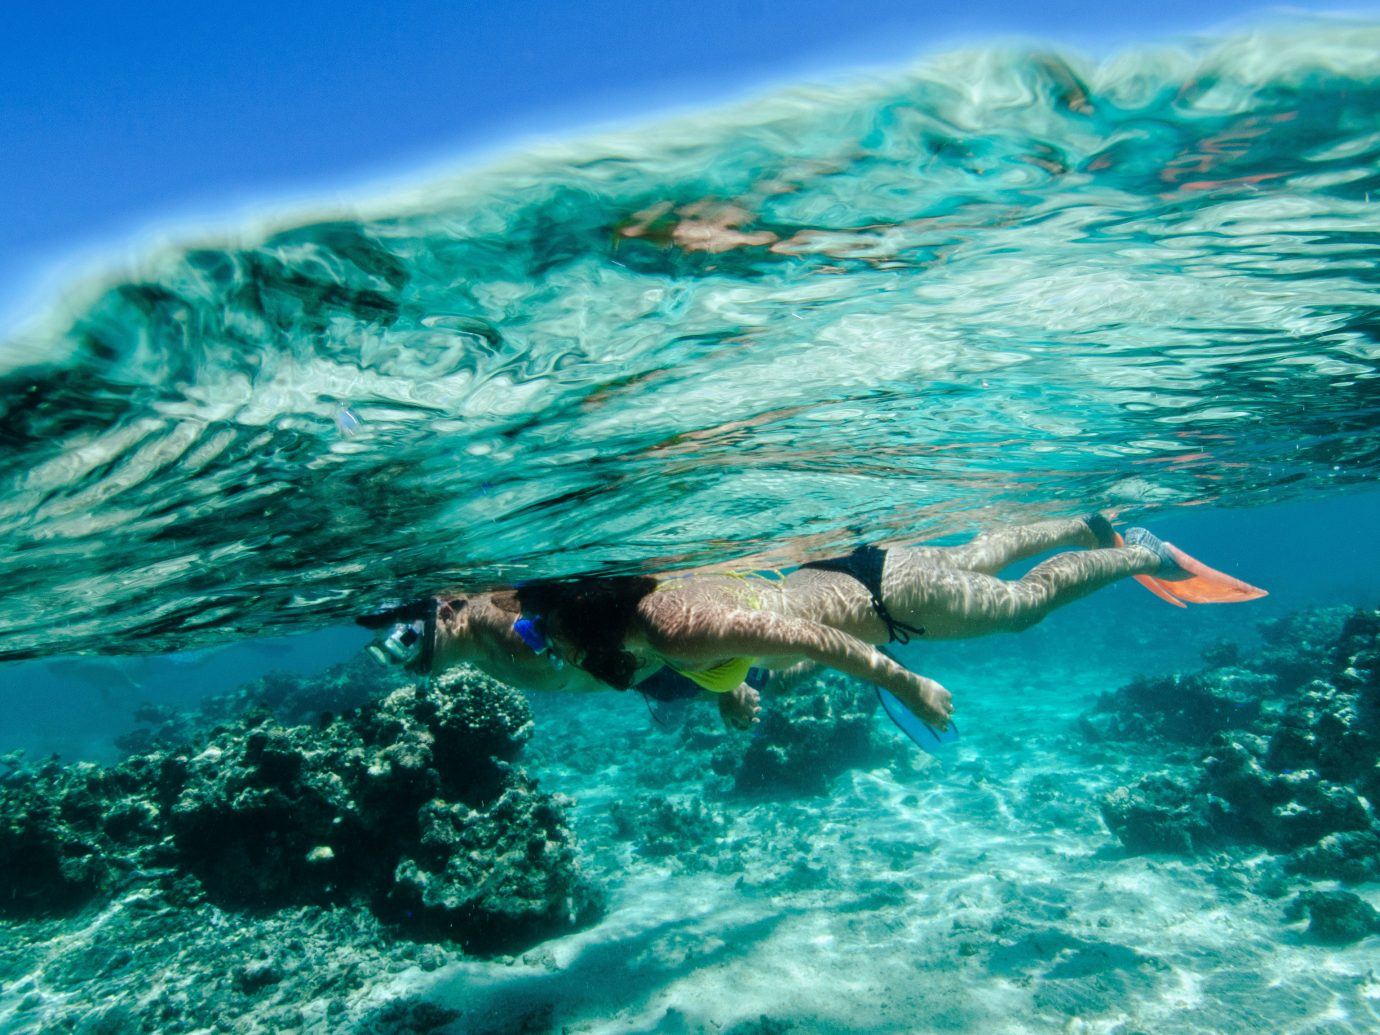 Trip Ideas water outdoor swimming marine biology sports underwater water sport Ocean Sea biology outdoor recreation diving wind wave snorkeling wave